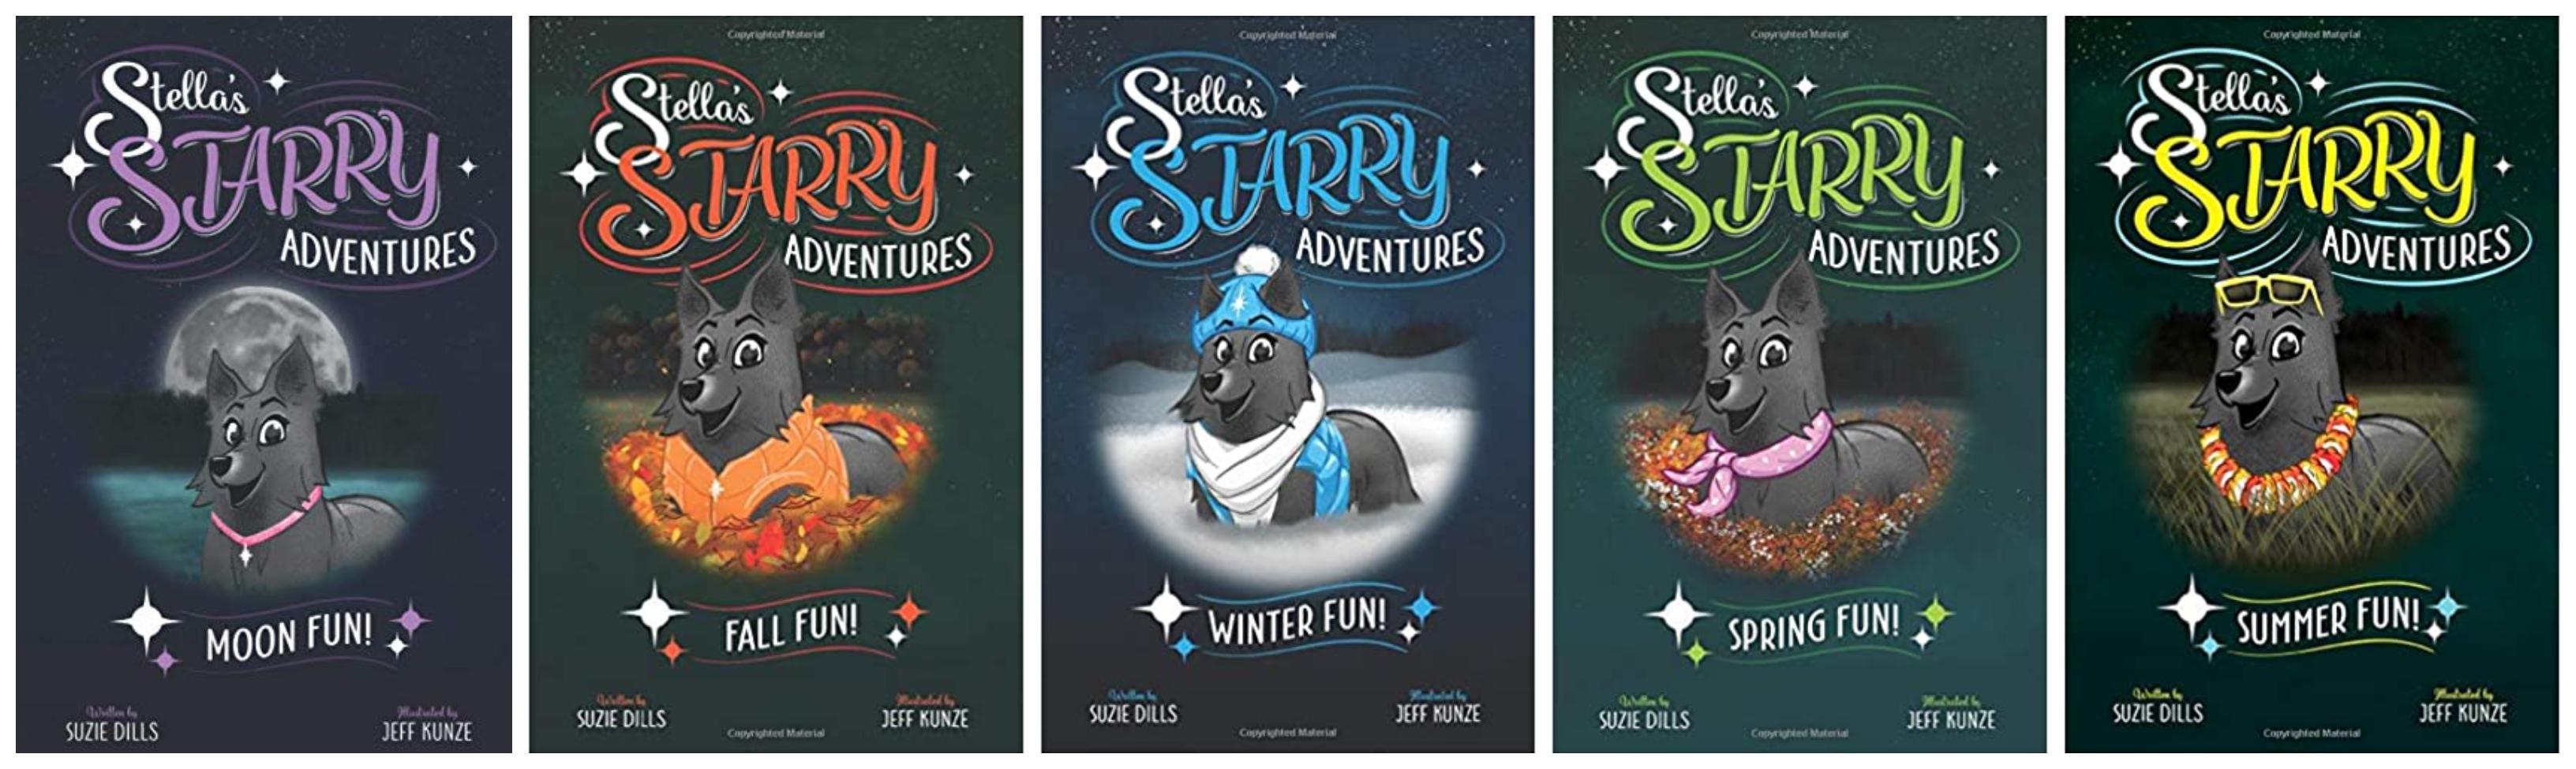 stella all books #starrytrails